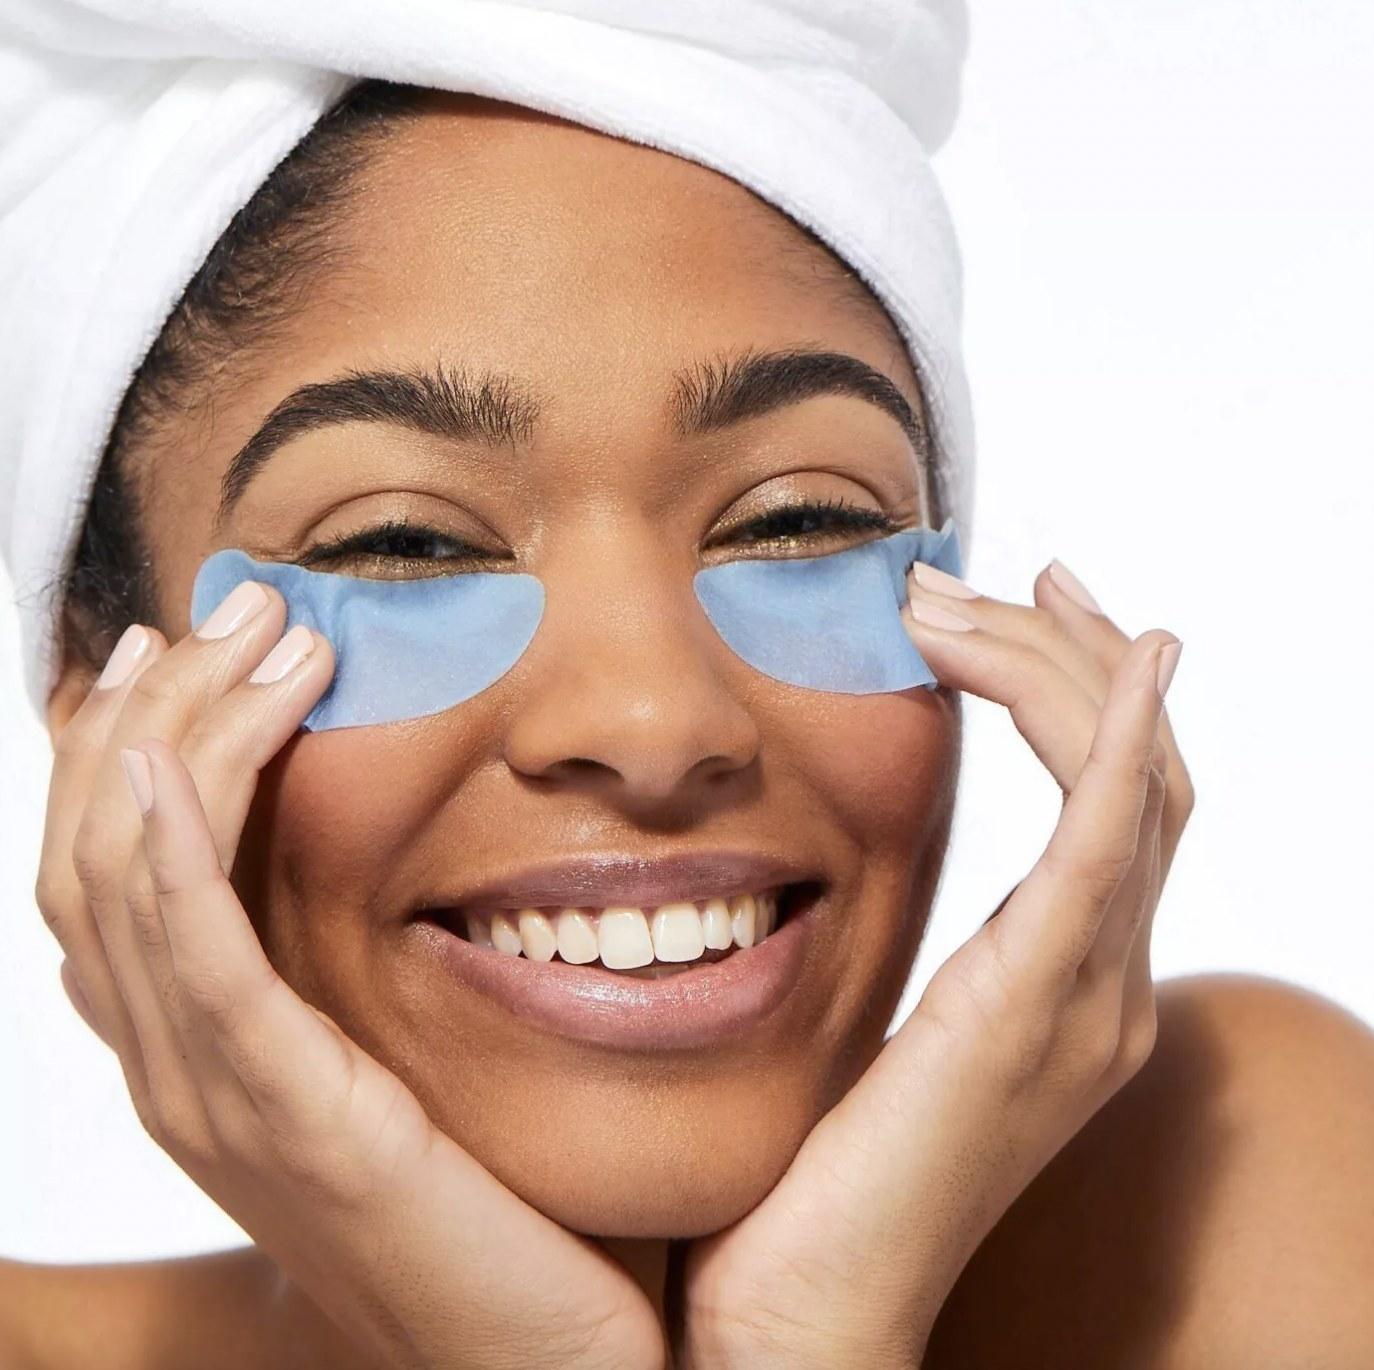 A woman wearing blue under eye masks